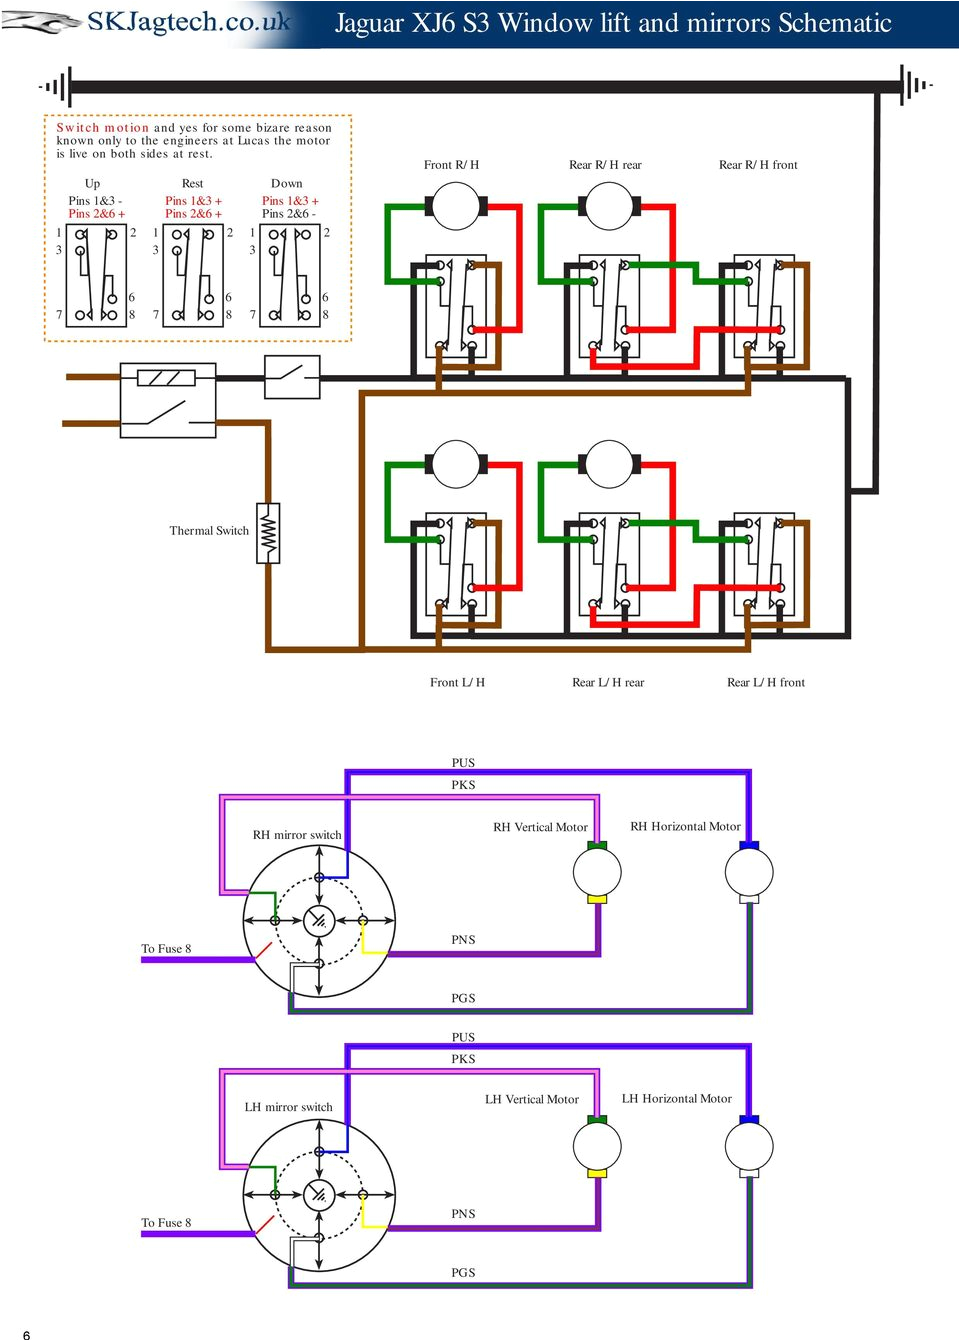 3 Wire Brake Light Diagram Jaguar Xj6 Series 3 Schematic Drawings Pdf Free Download